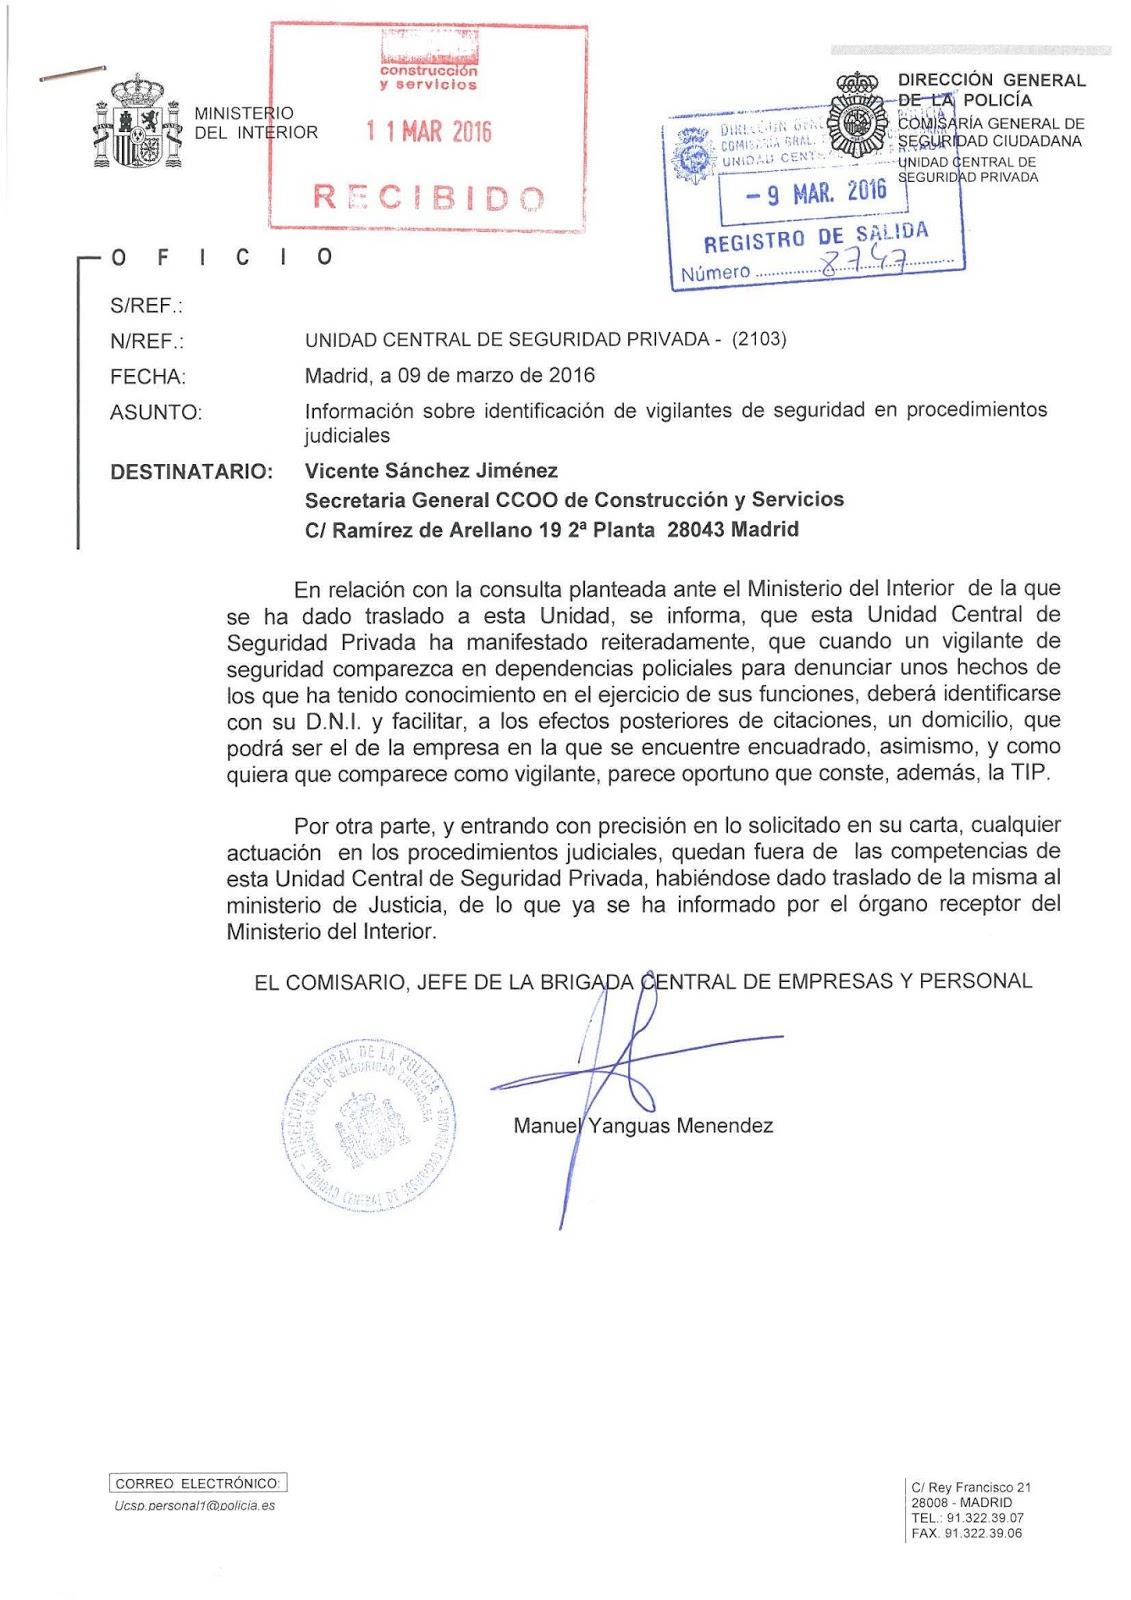 Casesaseccionsindicalccoo consultas al ministerio del for Llamado del ministerio del interior 2016